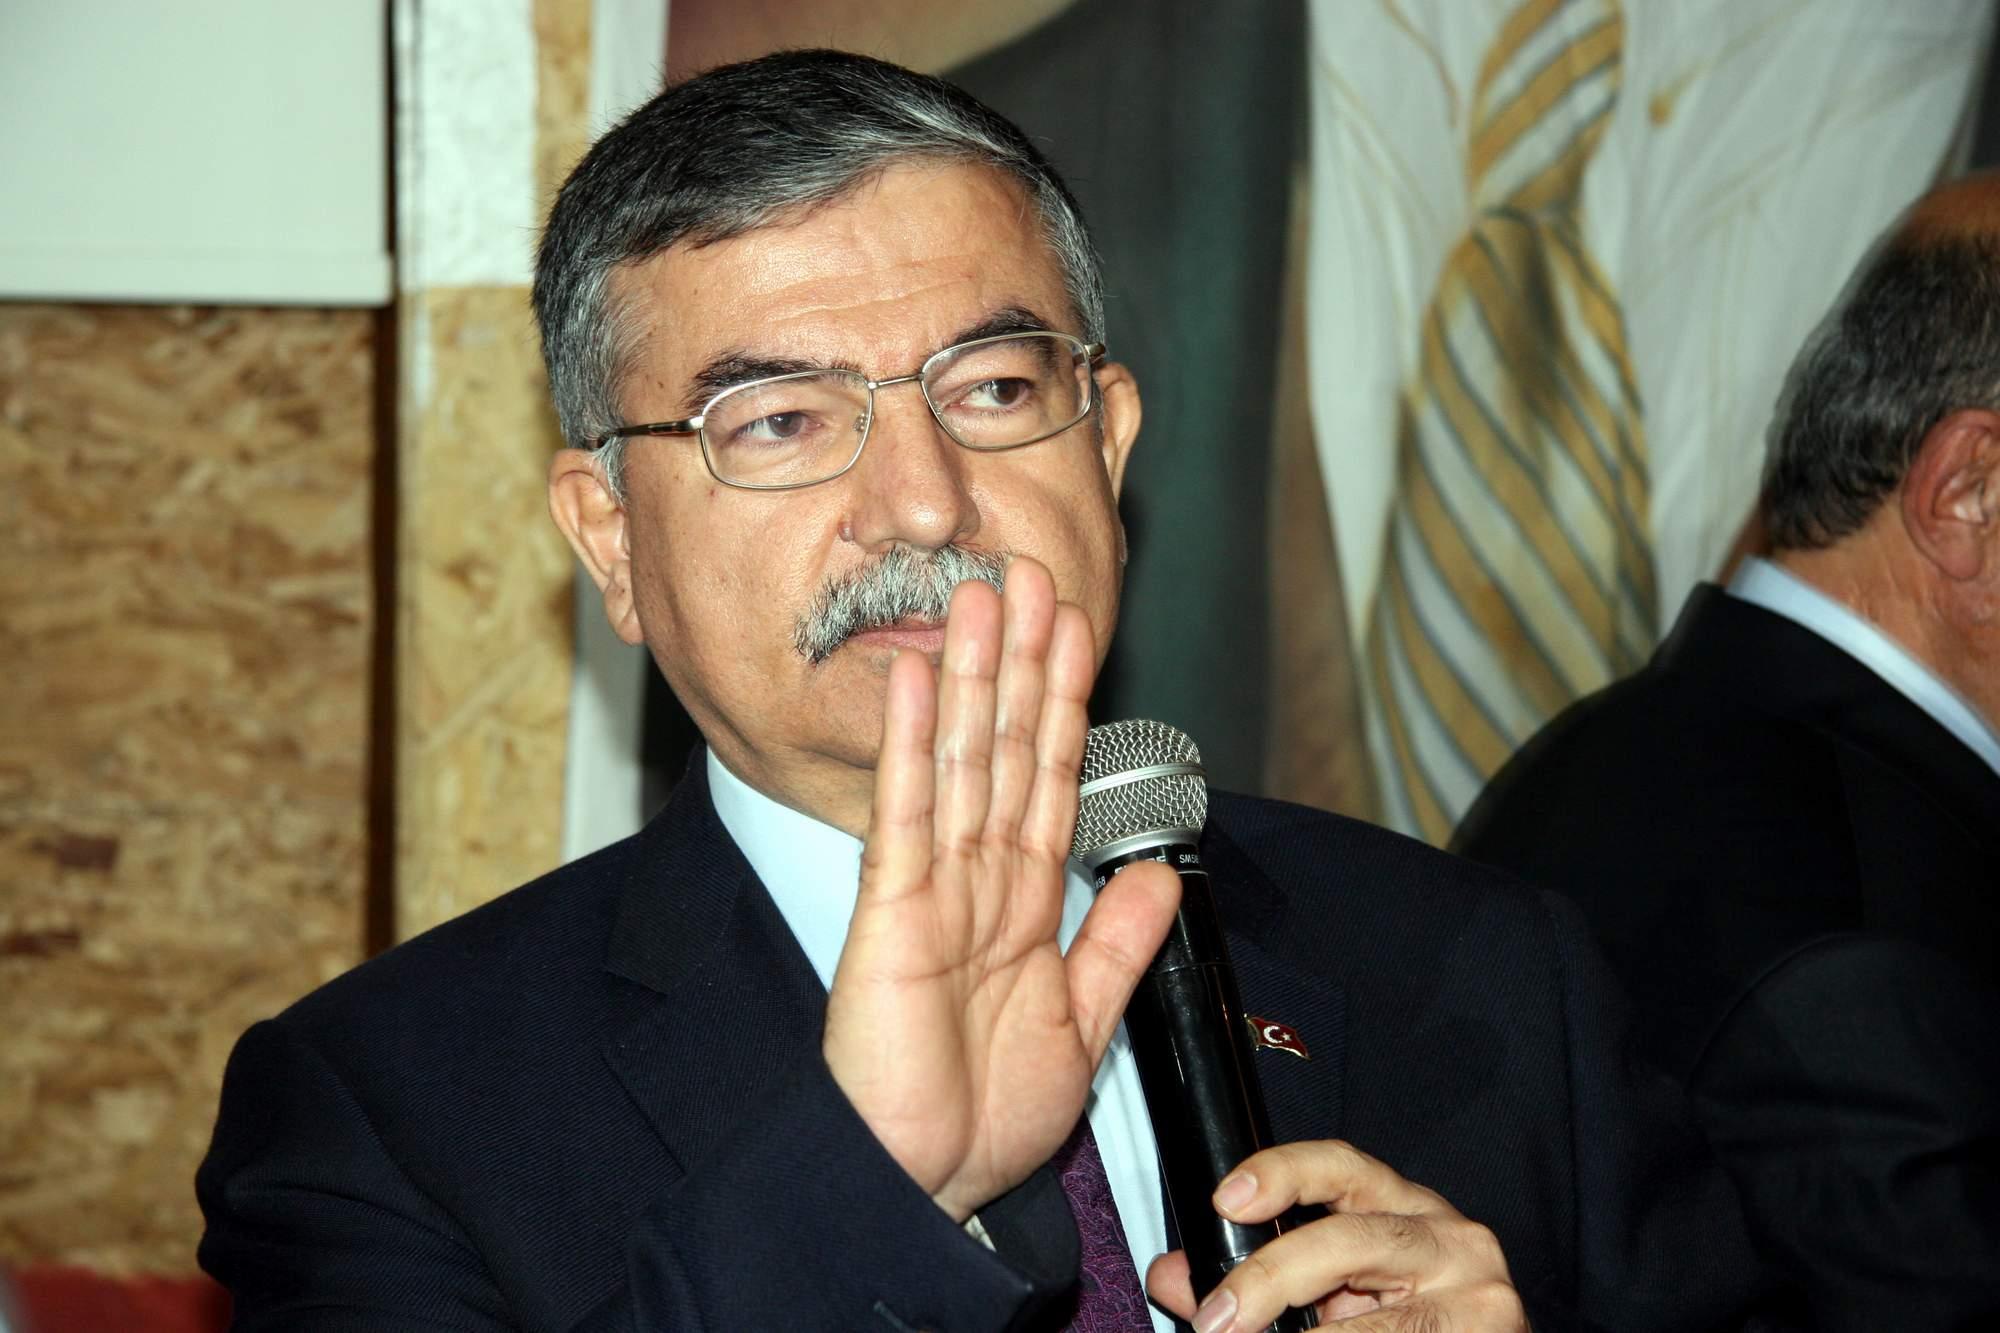 Savunma Bakanı: TSK savaşa hazırdır